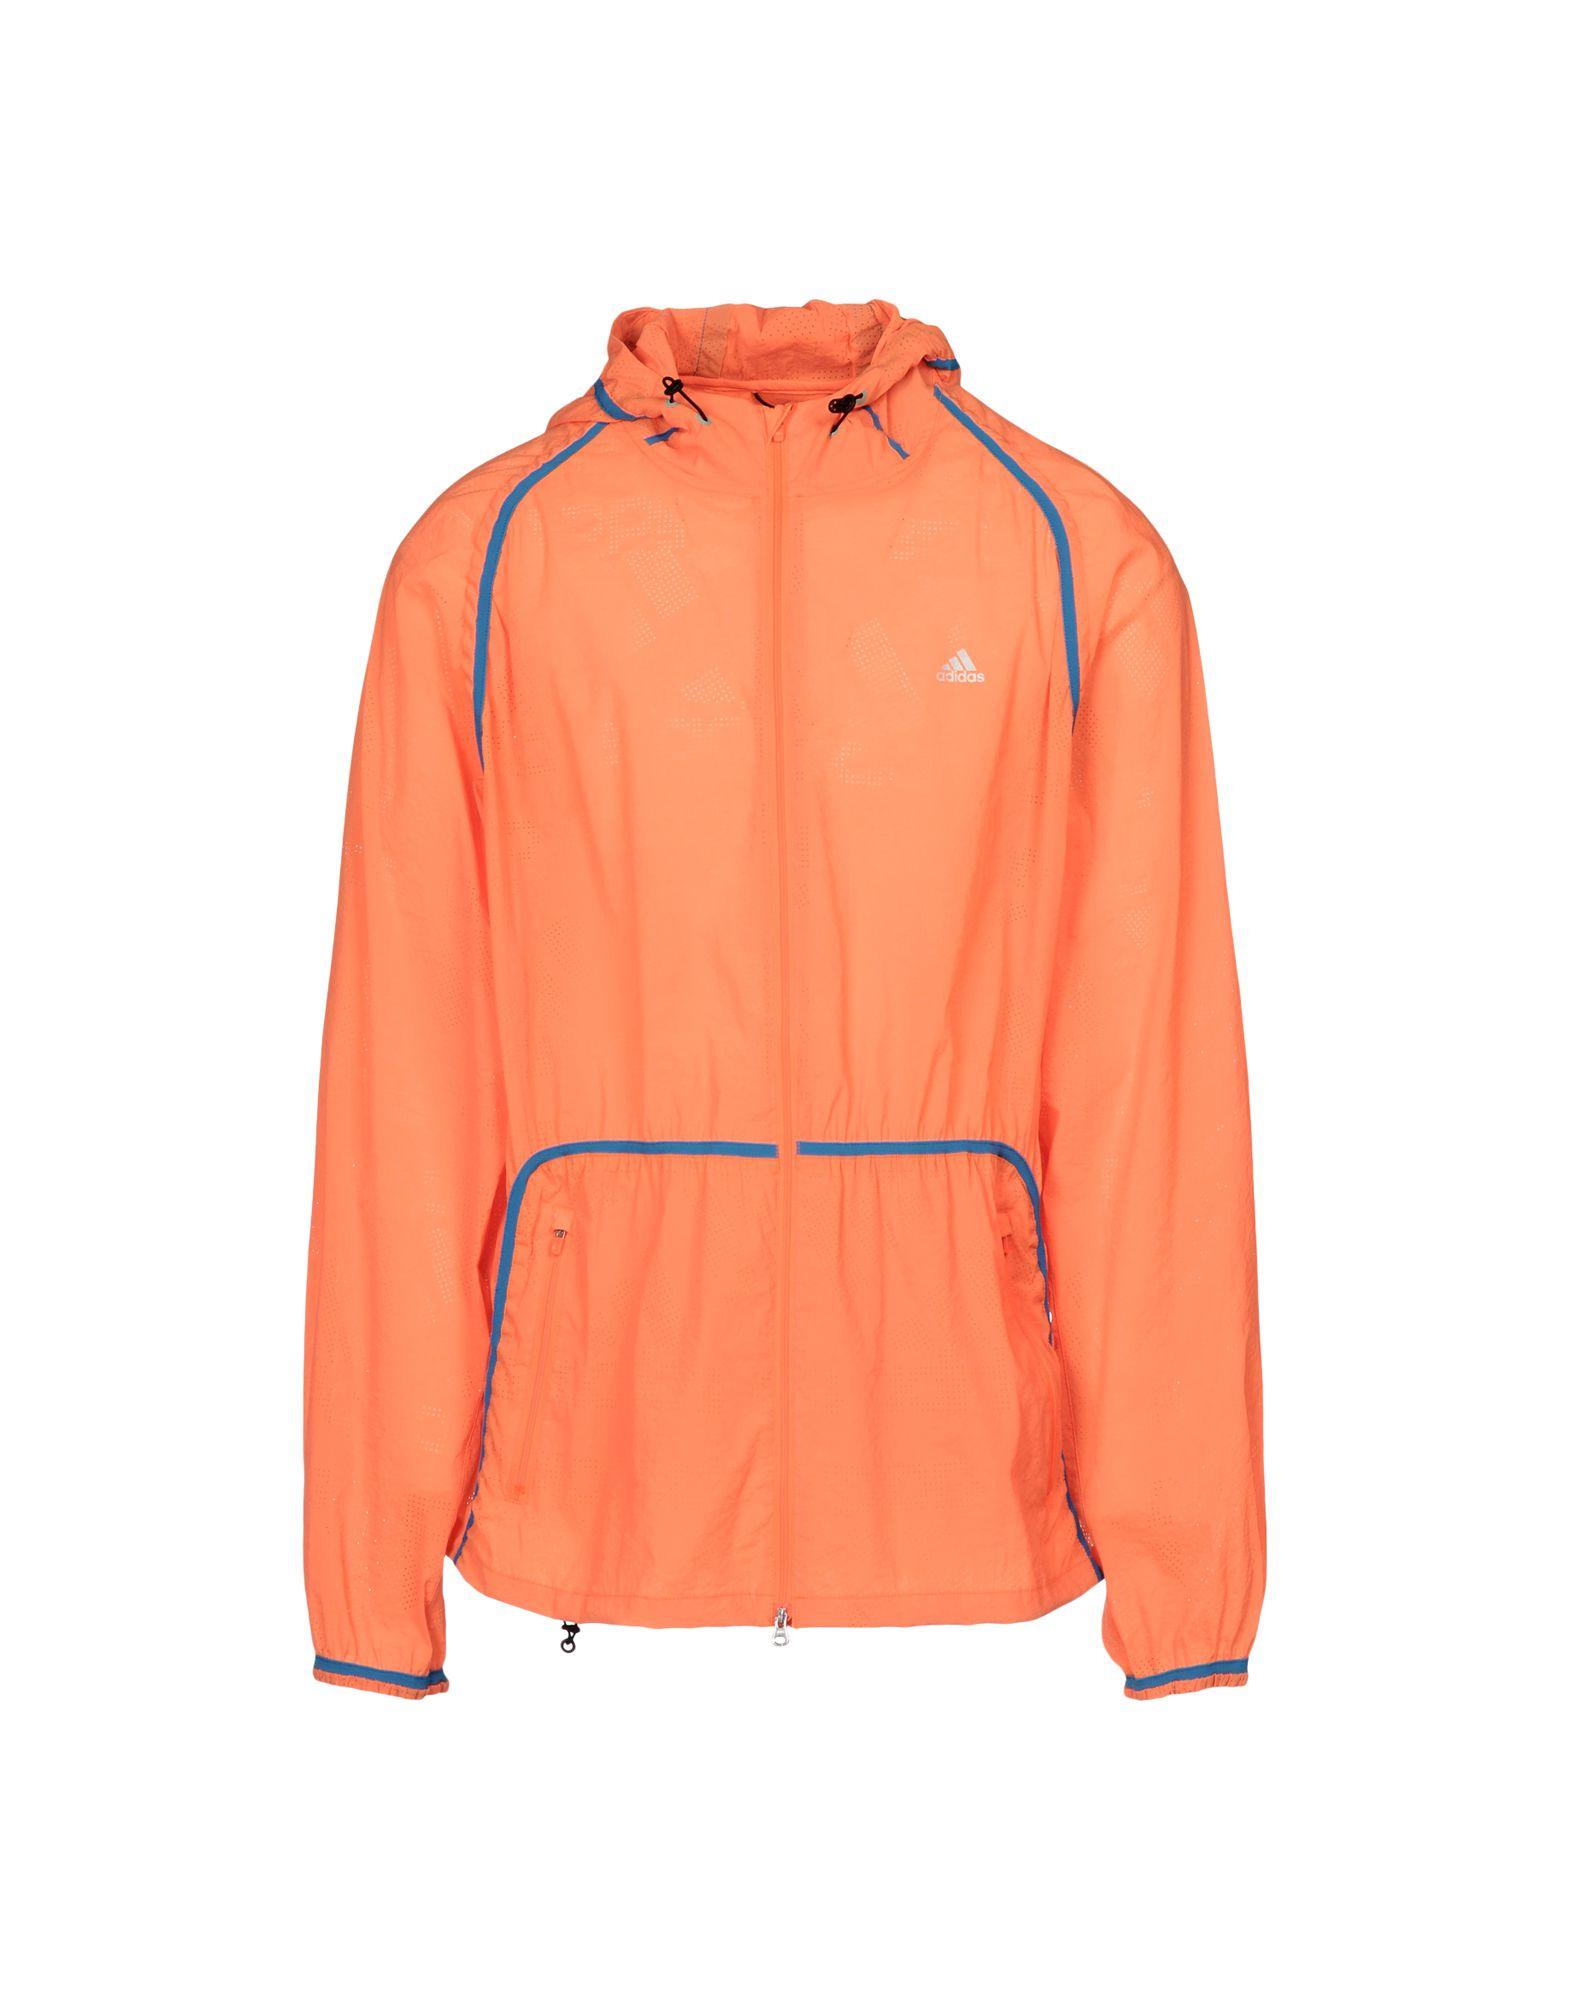 Giubbotto Adidas By Kolor Wvn Jacket Logo Perforated Woven Jacket - Uomo - Acquista online su